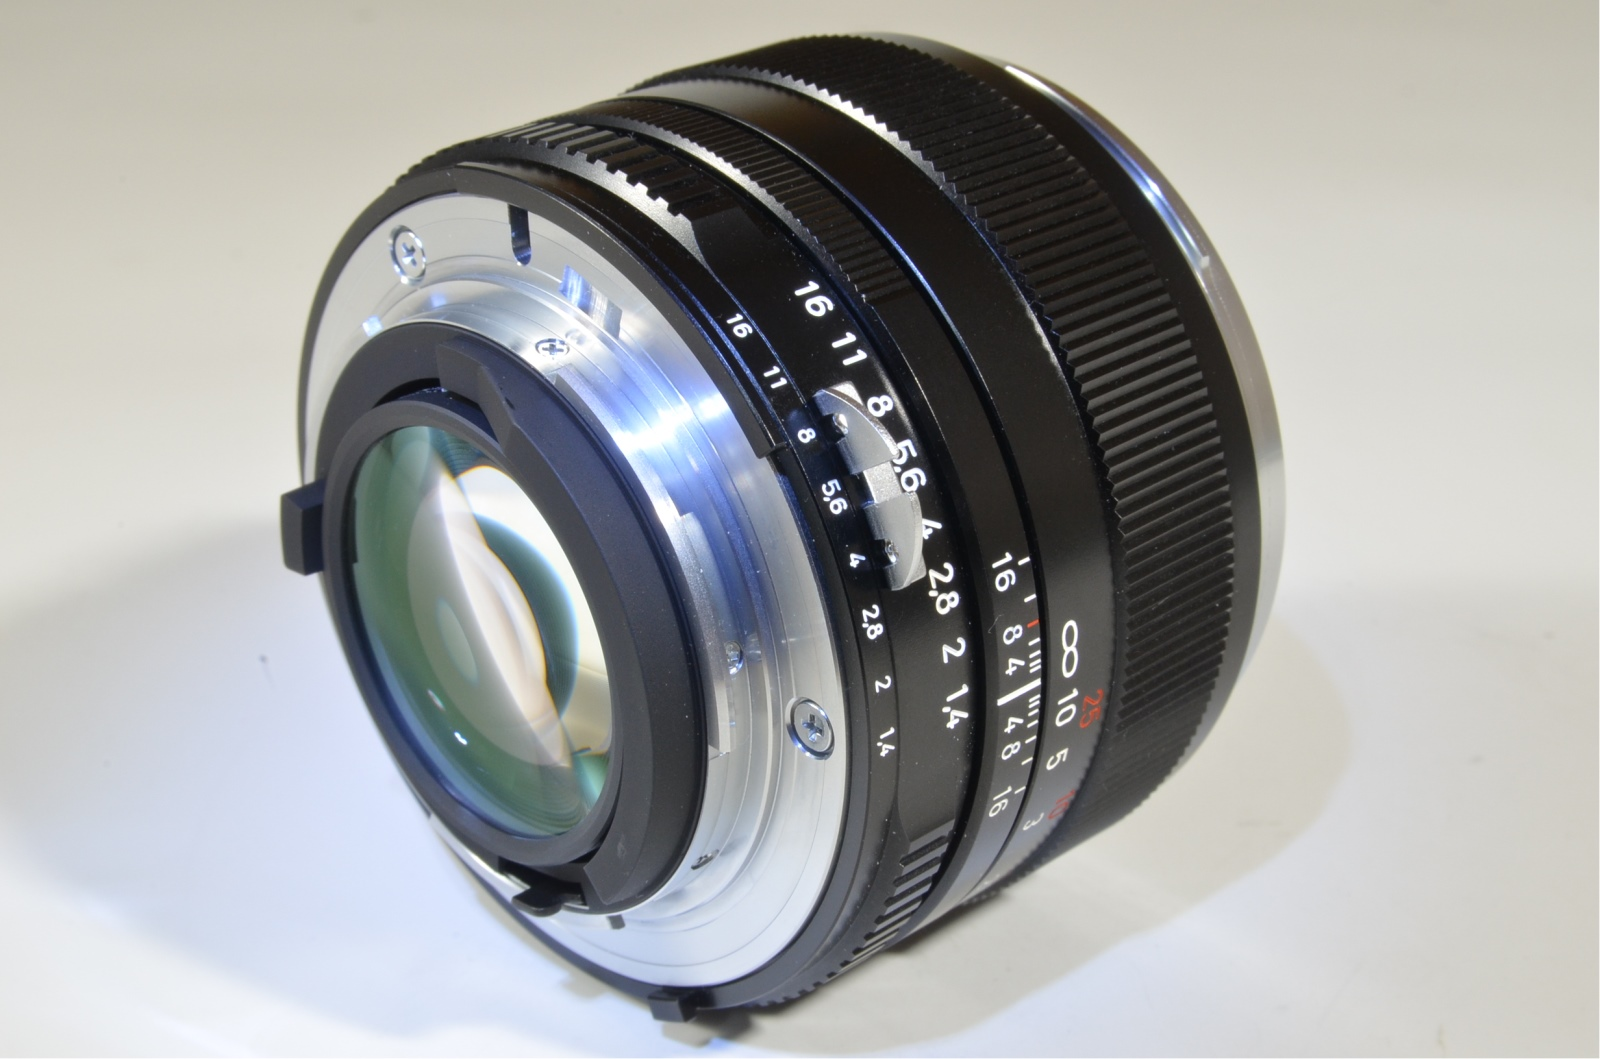 carl zeiss planar t* 50mm f1.4 zf for nikon ai-s ais